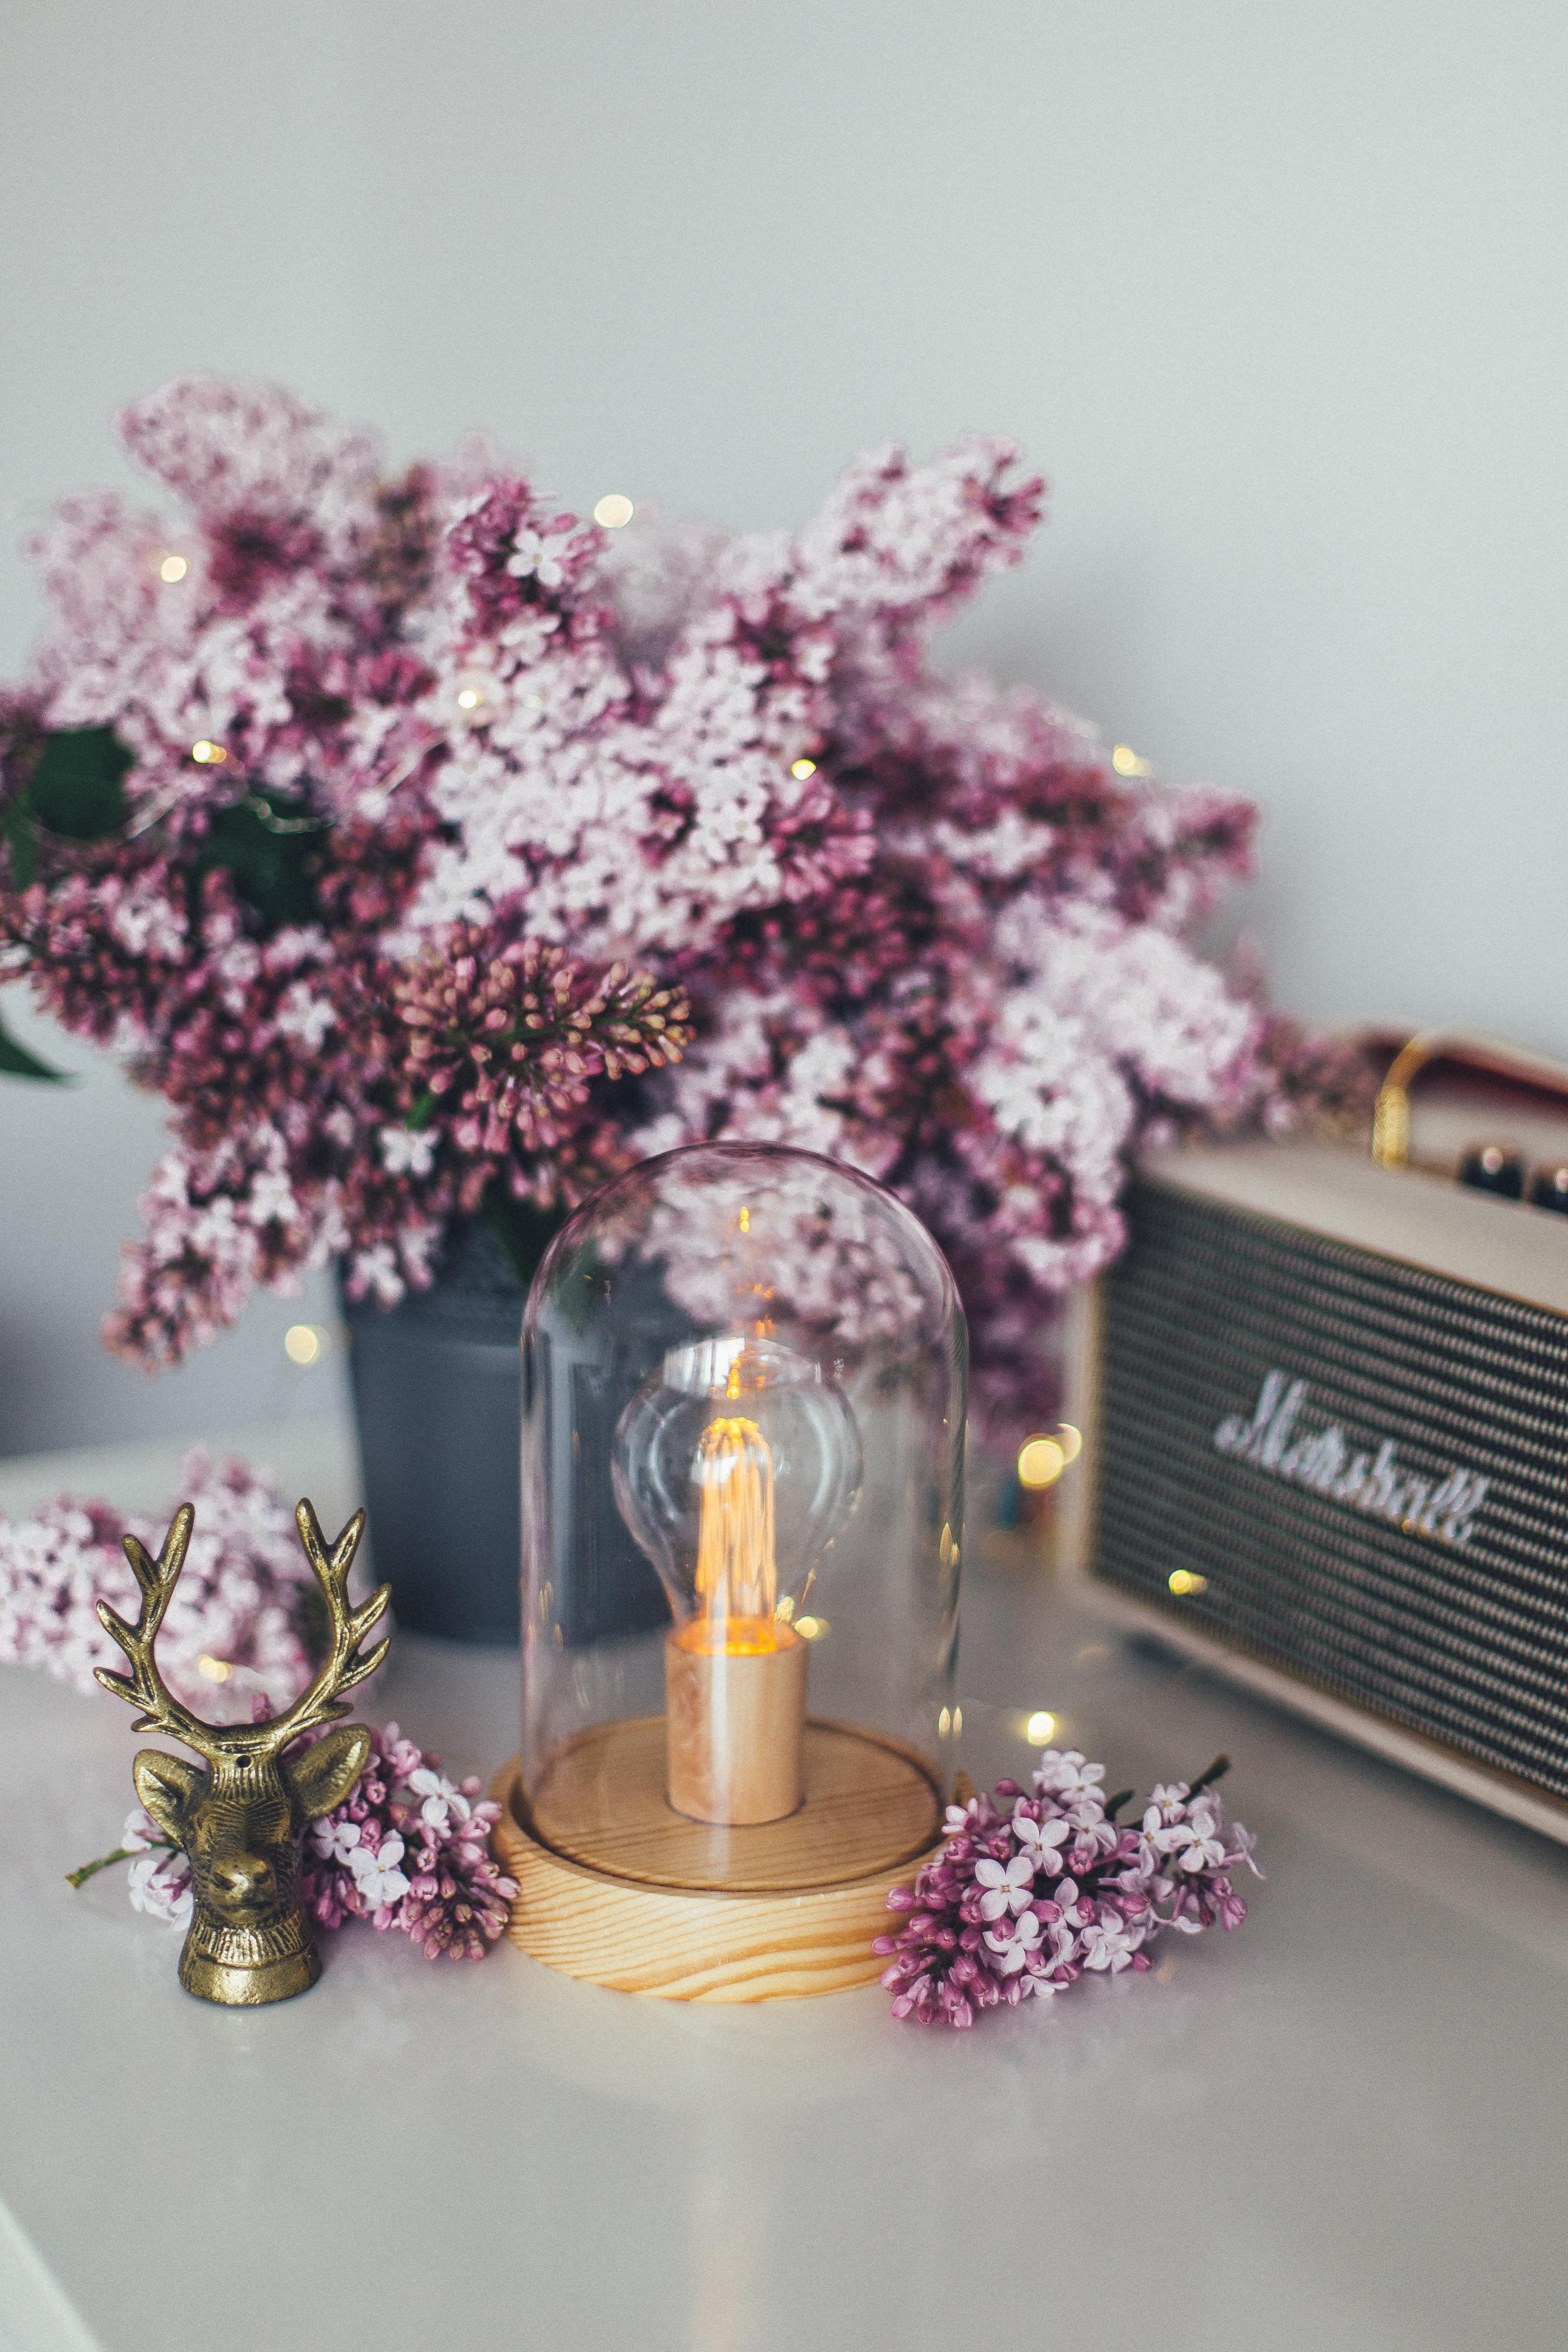 pink and purple flowers beside brown Marshall guitar head amplifier